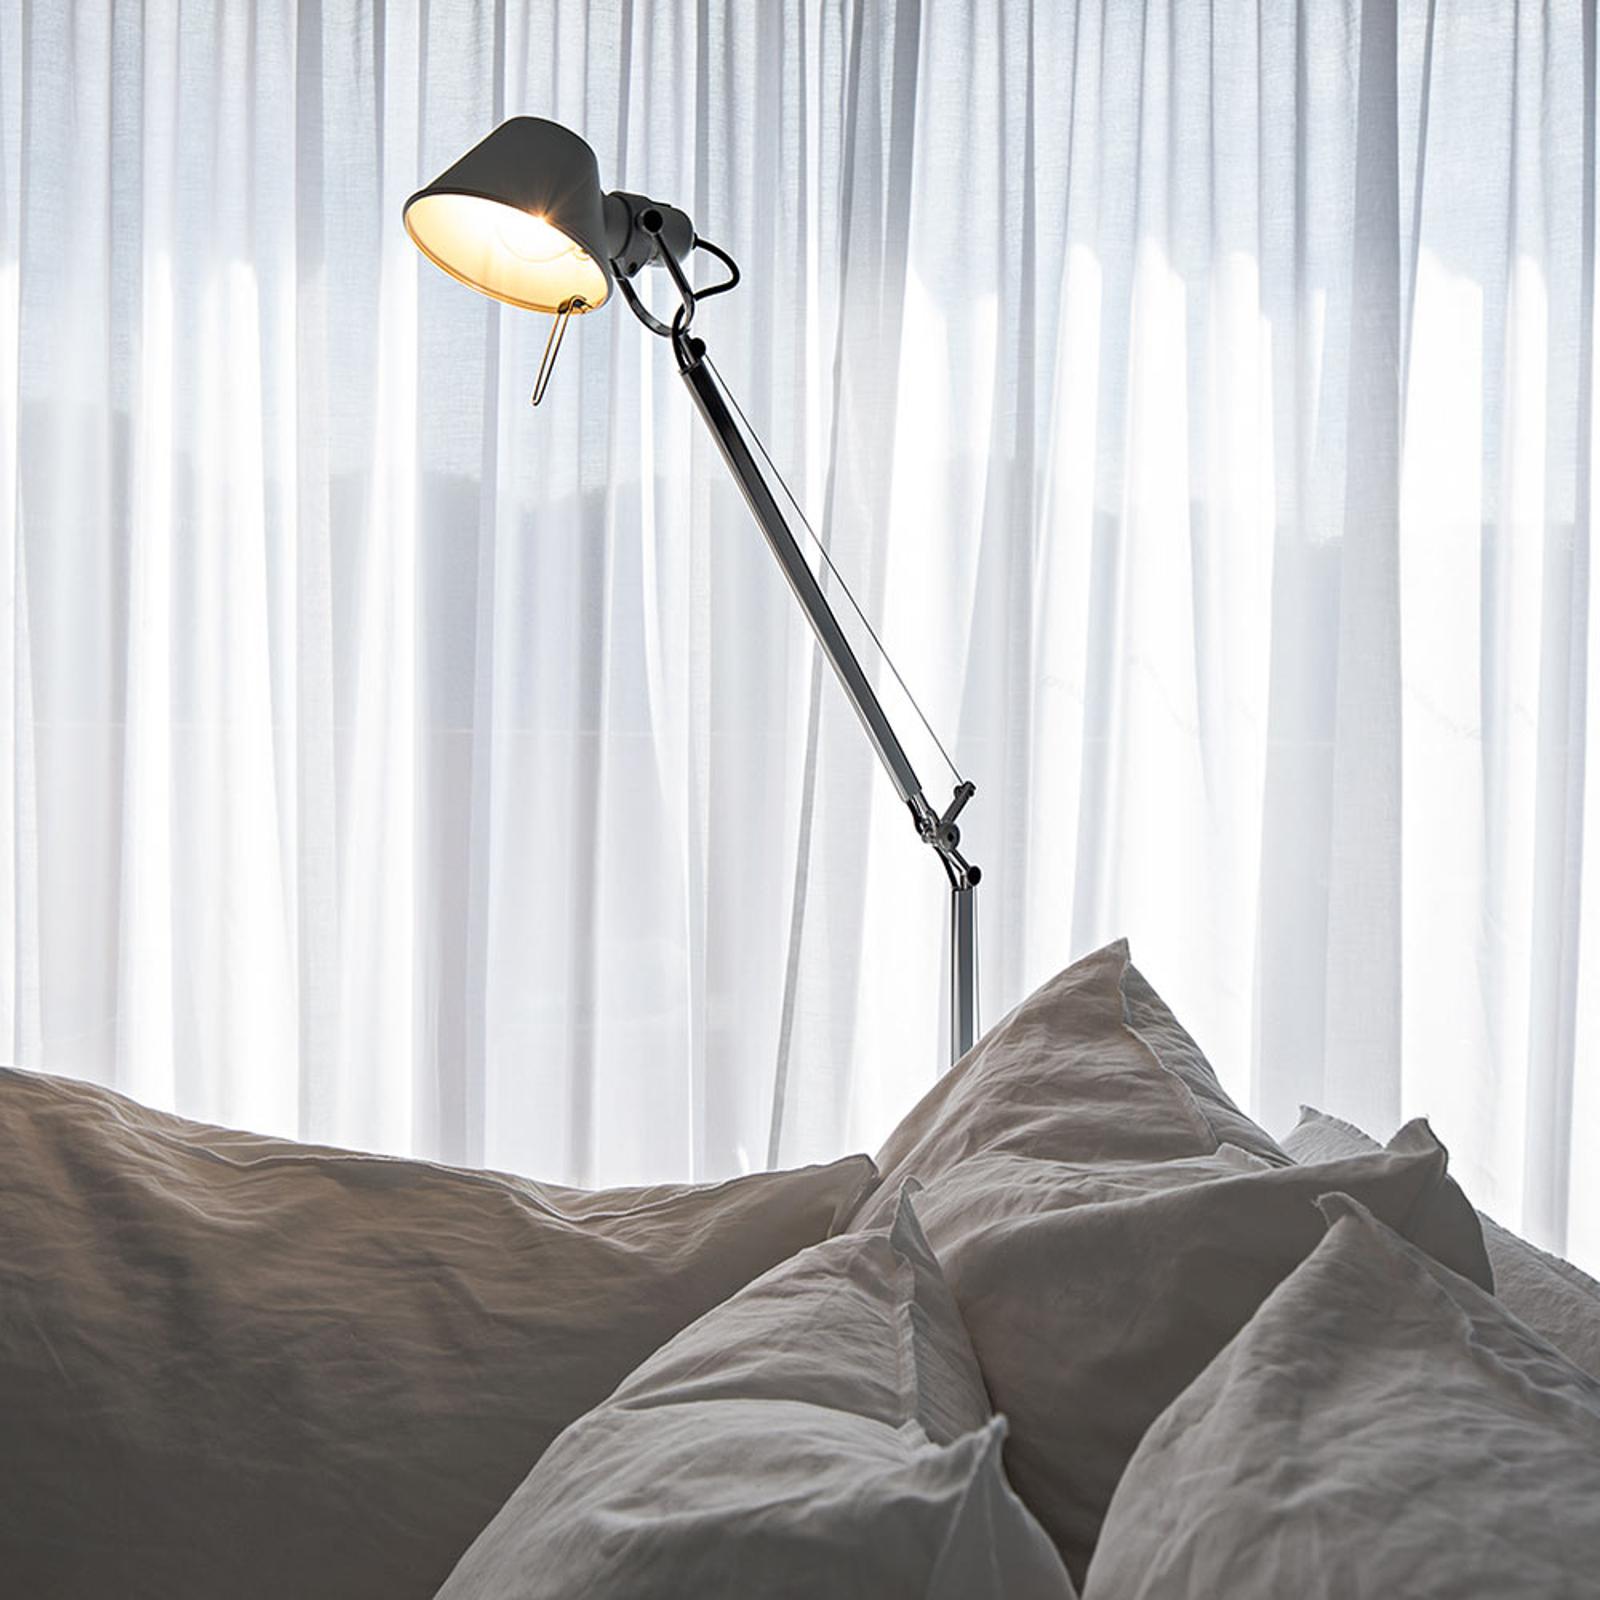 Artemide Tolomeo Maxi LED golvlampa | Lamp24.se